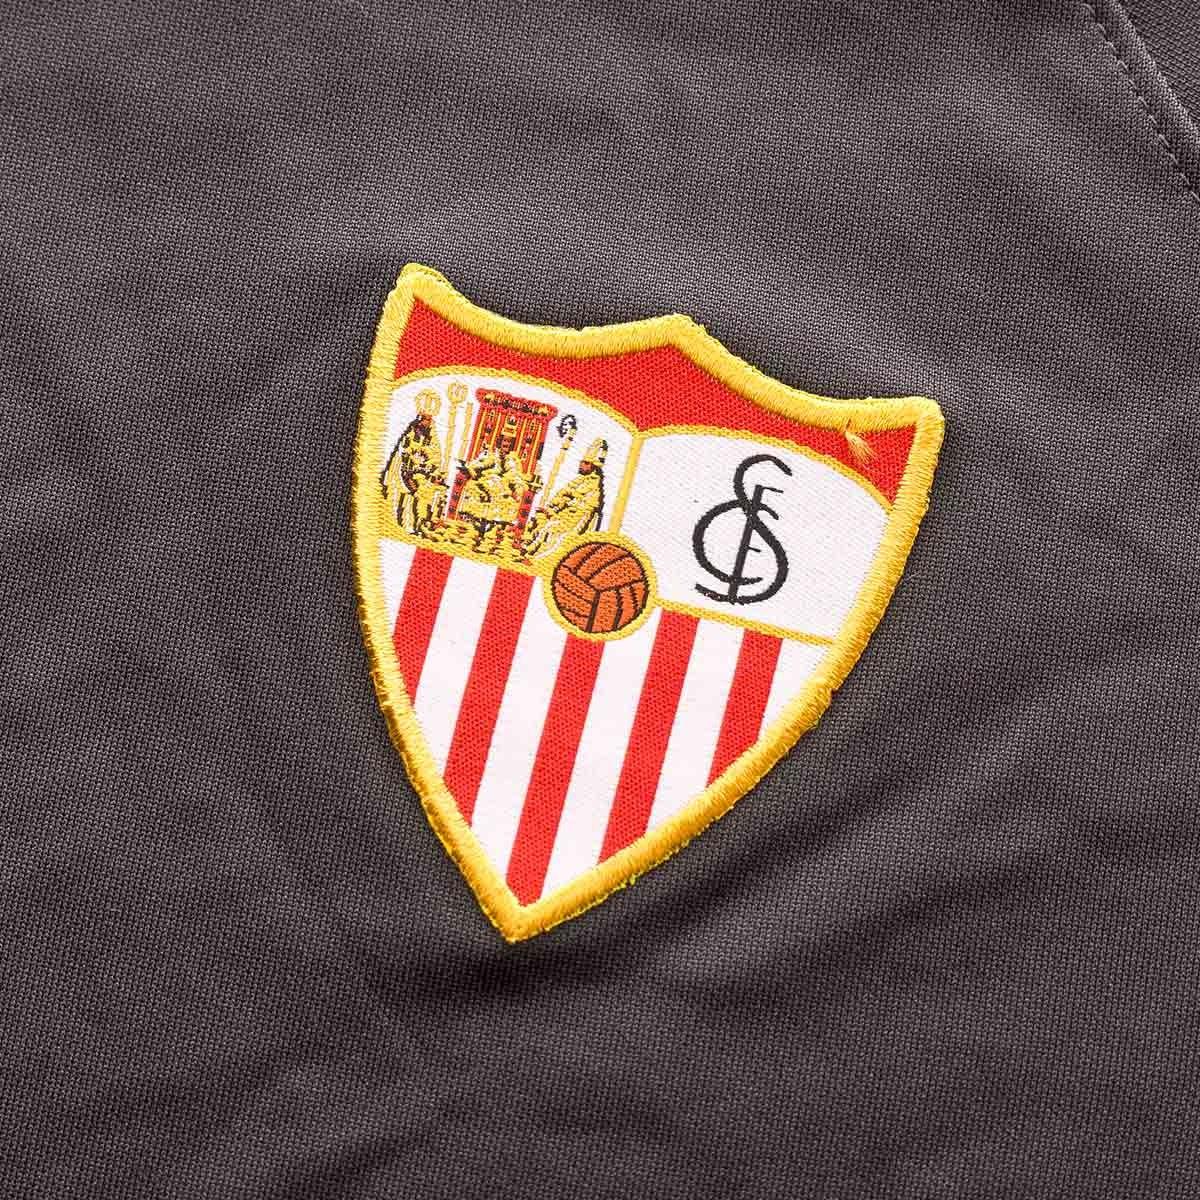 5d6f5c2d Camiseta Nike Sevilla FC Training 2018-2019 Niño Grey - Tienda de fútbol  Fútbol Emotion